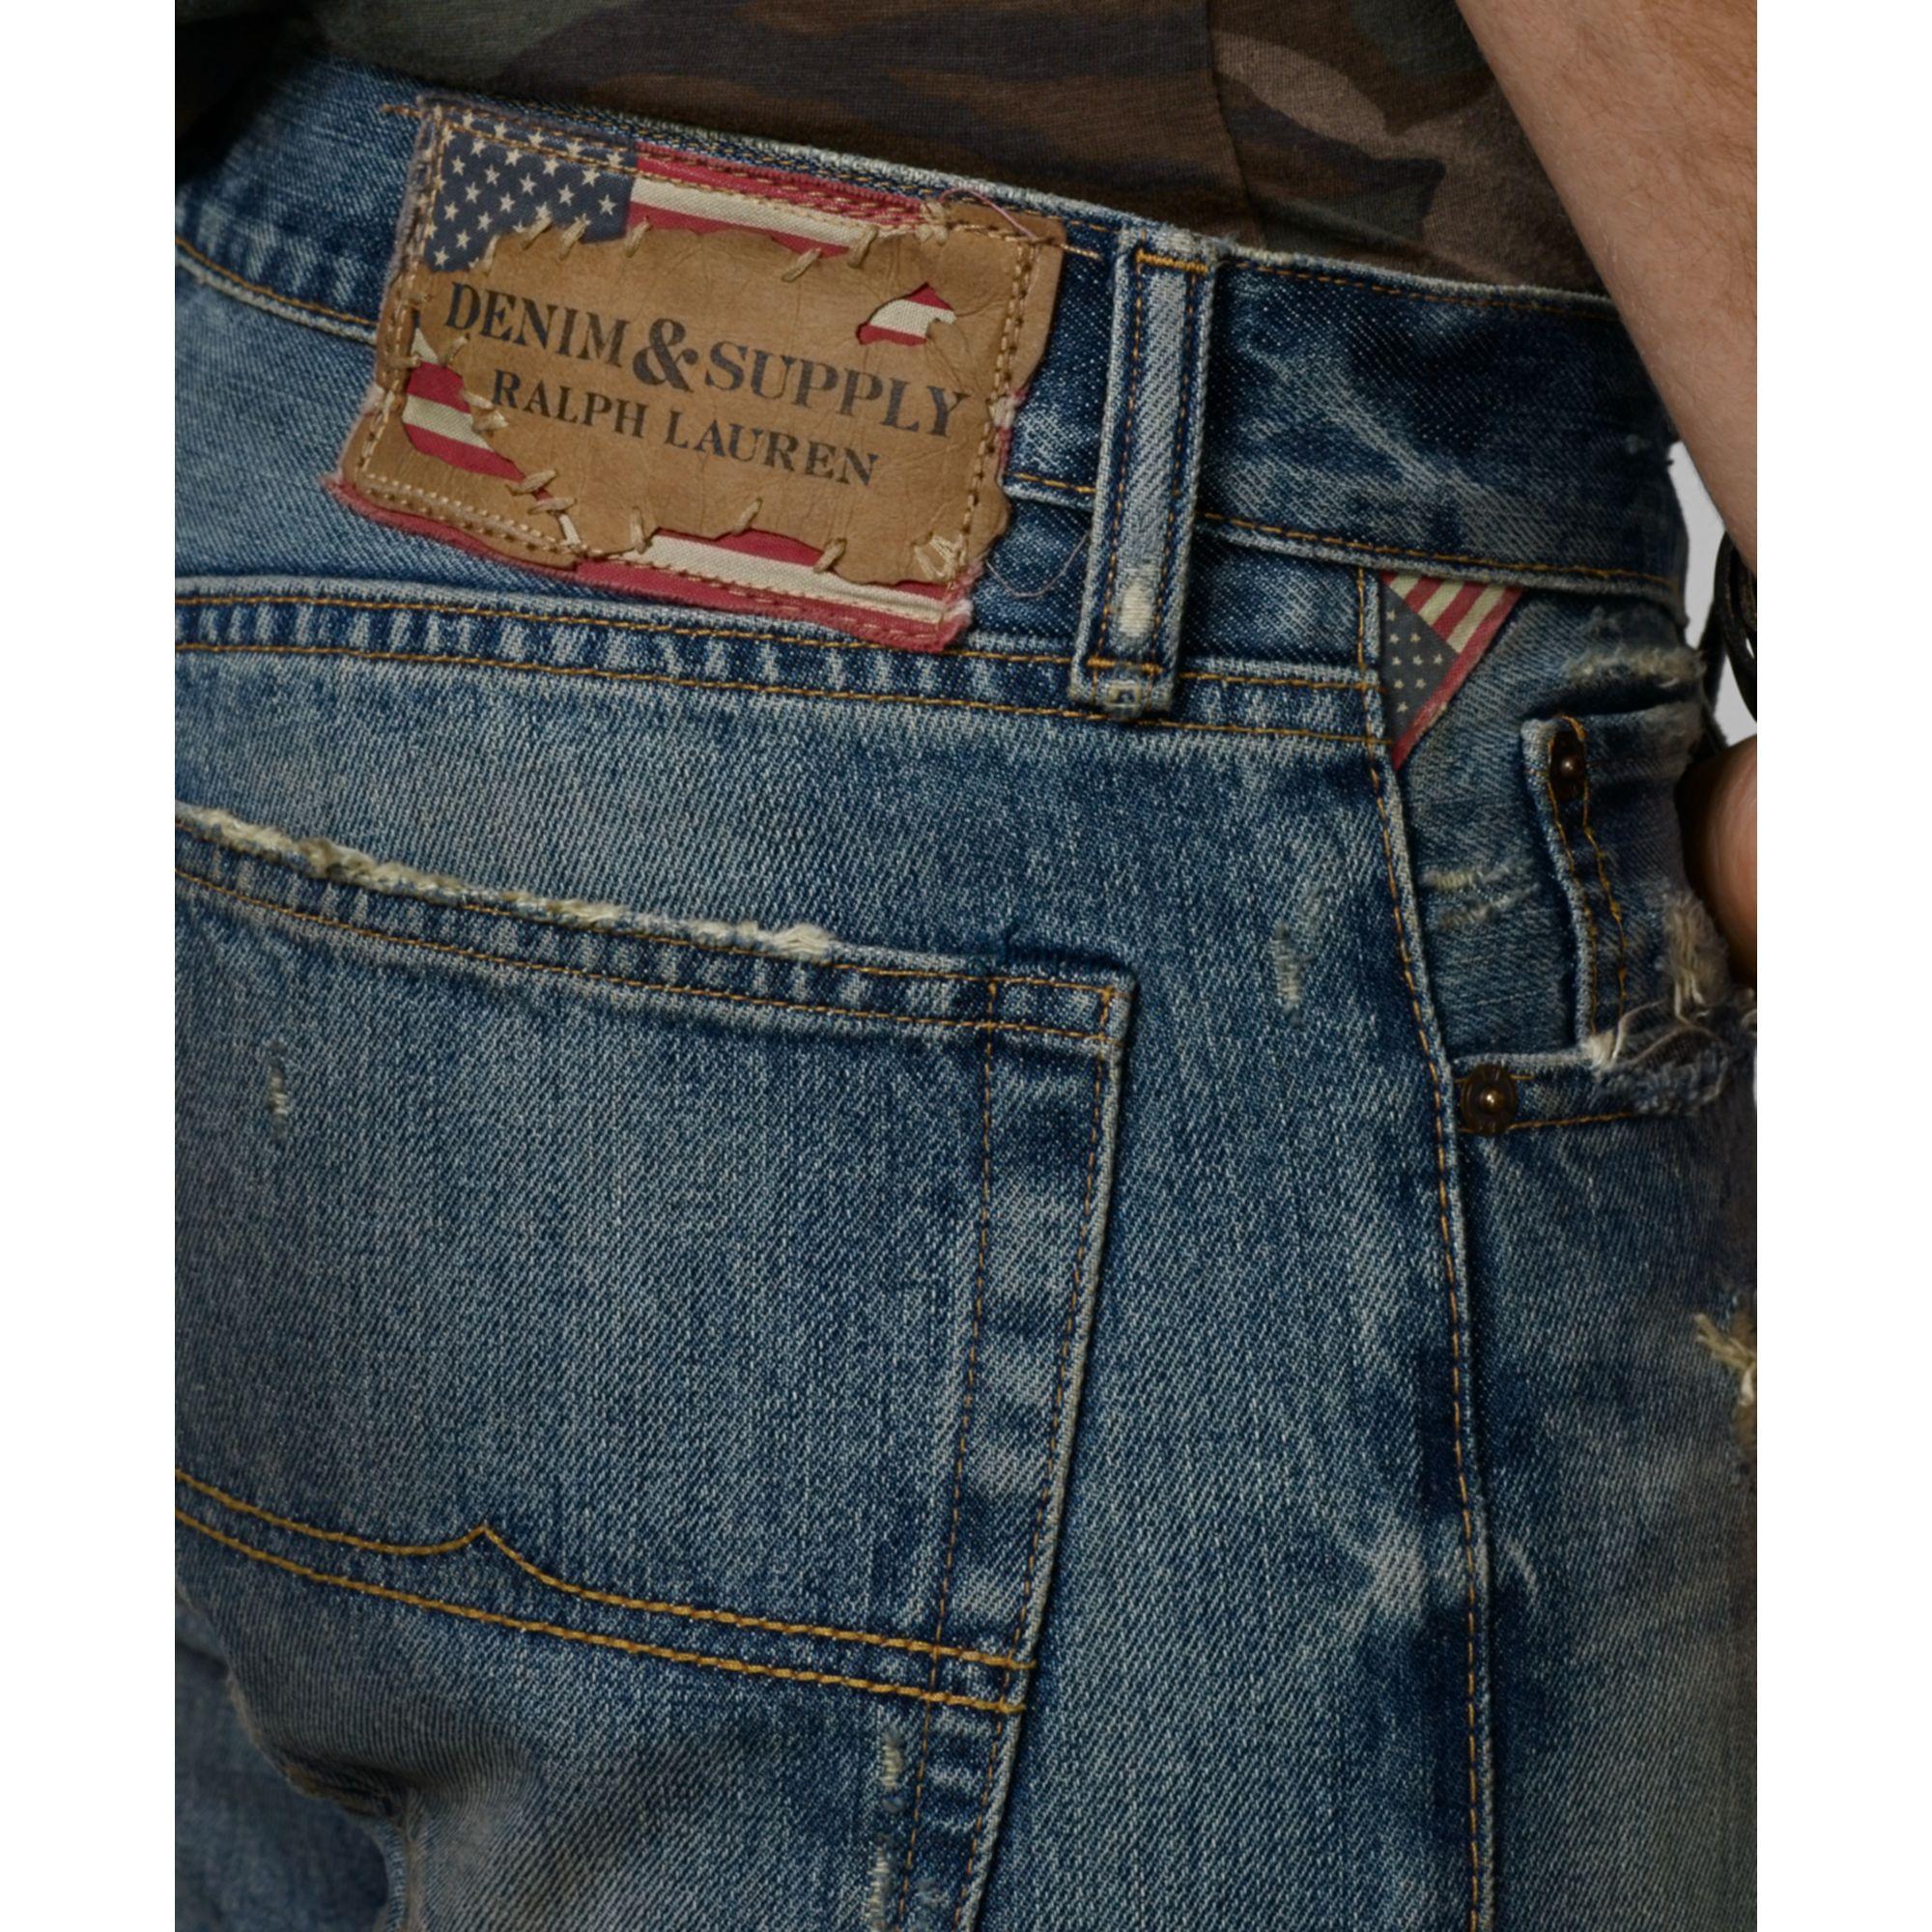 902045779 Denim   Supply Ralph Lauren Slouch Fit Astoria Jeans in Blue for Men ...